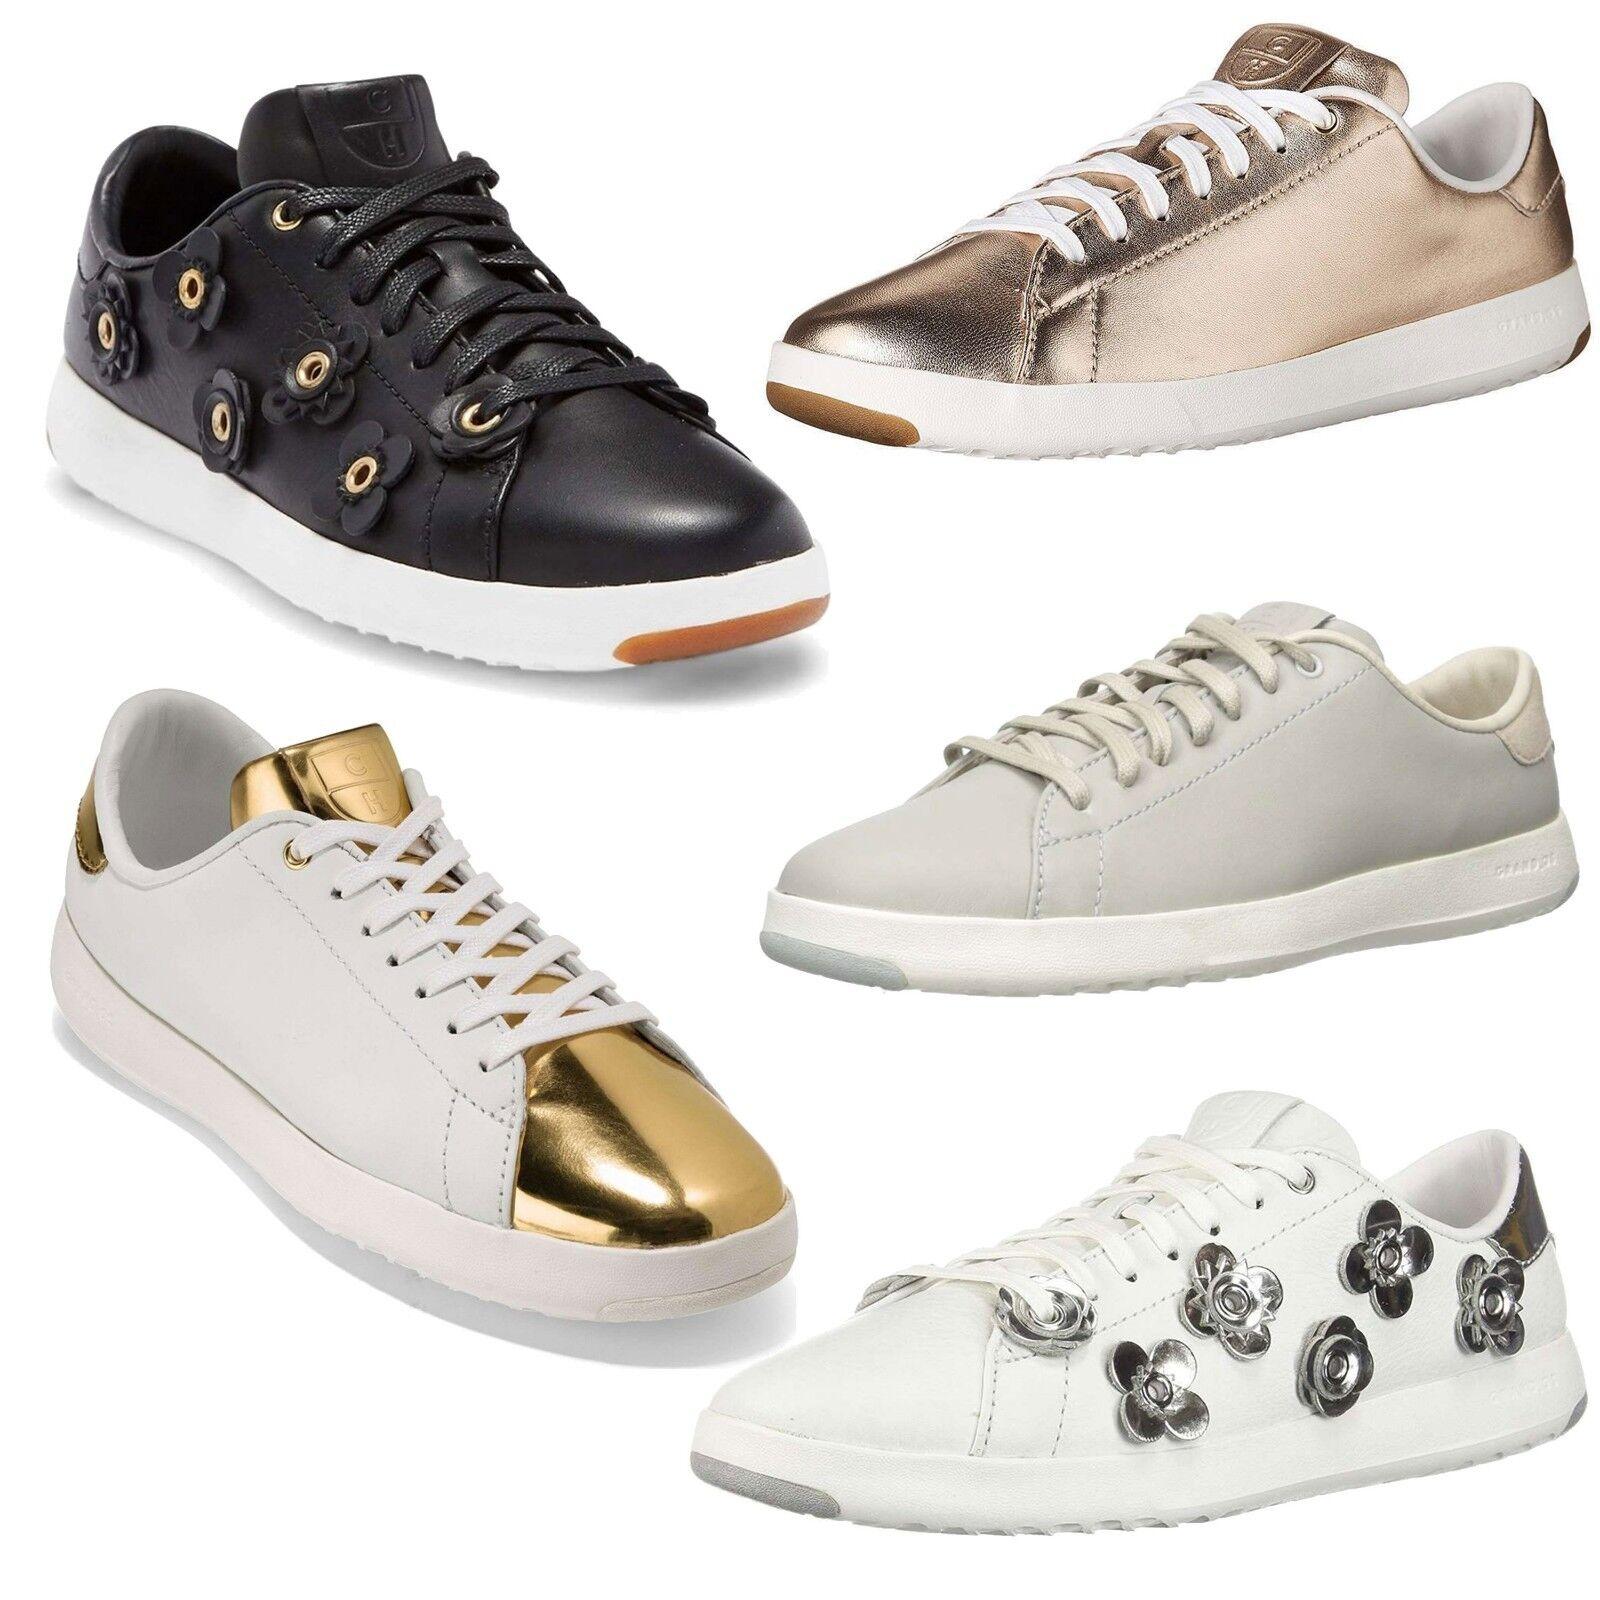 Cole Haan Wouomo Grandpro CrossCourt Tennis scarpe GrandOS Lightweight scarpe da ginnastica